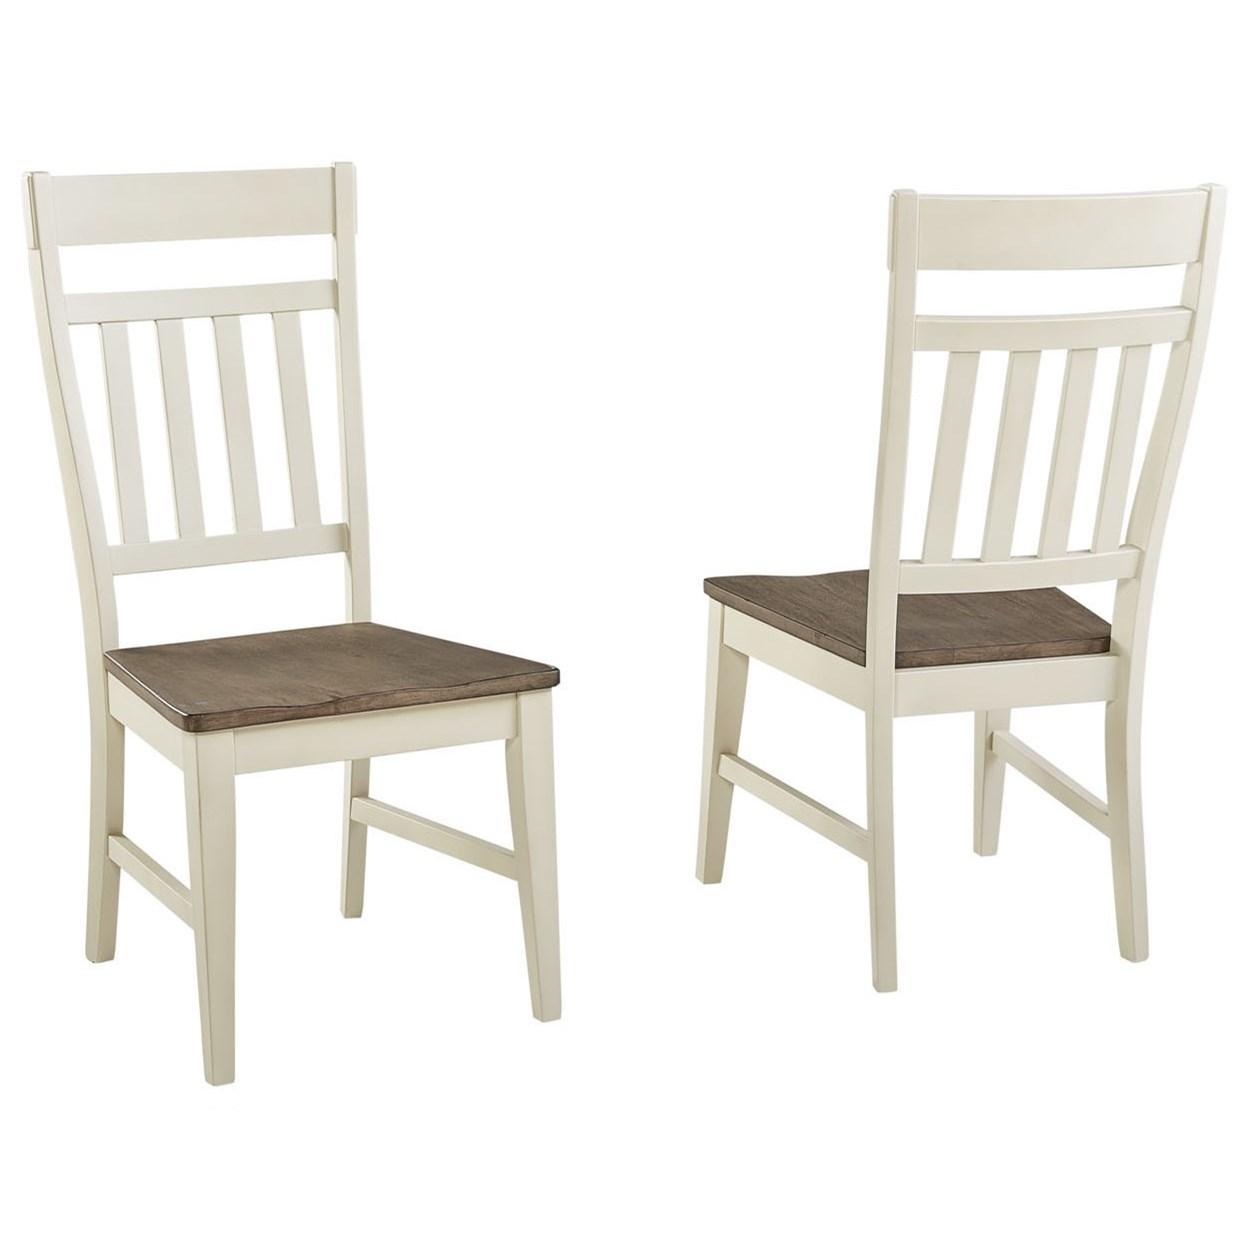 Bremerton Slatback Upholstered Side Chair by A-A at Walker's Furniture